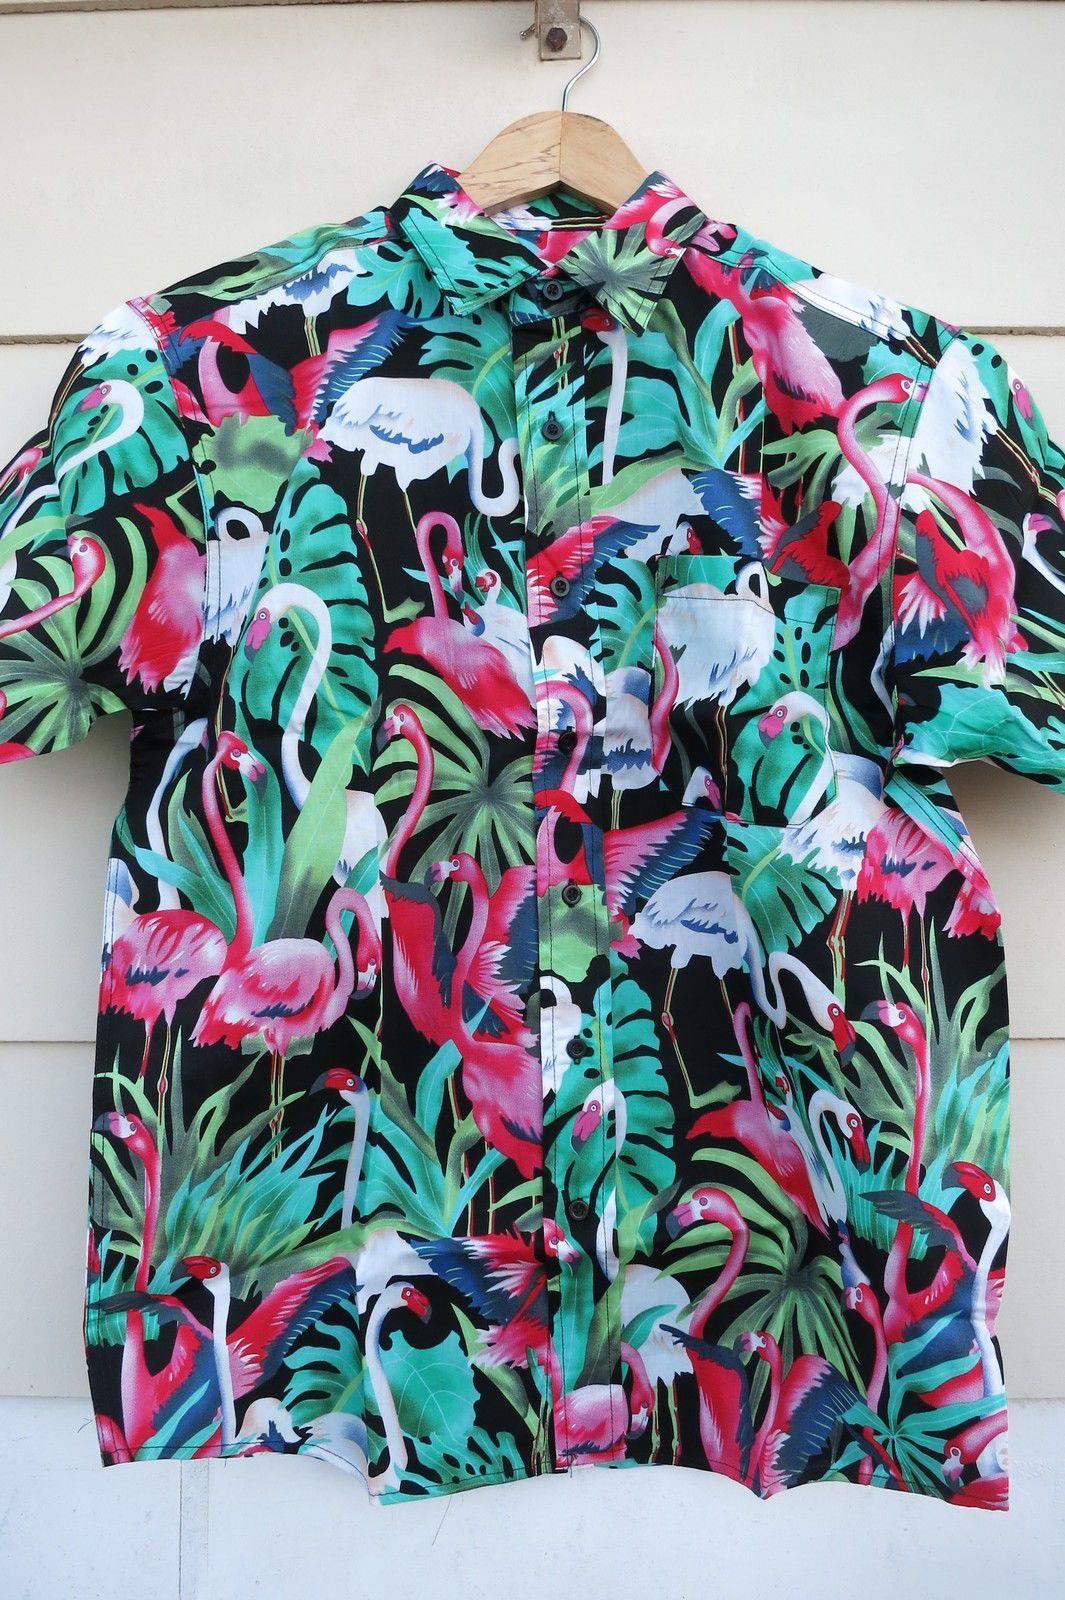 b7db0585 Hawaiian Shirt Tiki Flamingo Hot Rod 50s Rockabilly Green Pink White S-2XL  Mens in Clothing, Shoes, Accessories, Men's Clothing, Casual Shirts | eBay